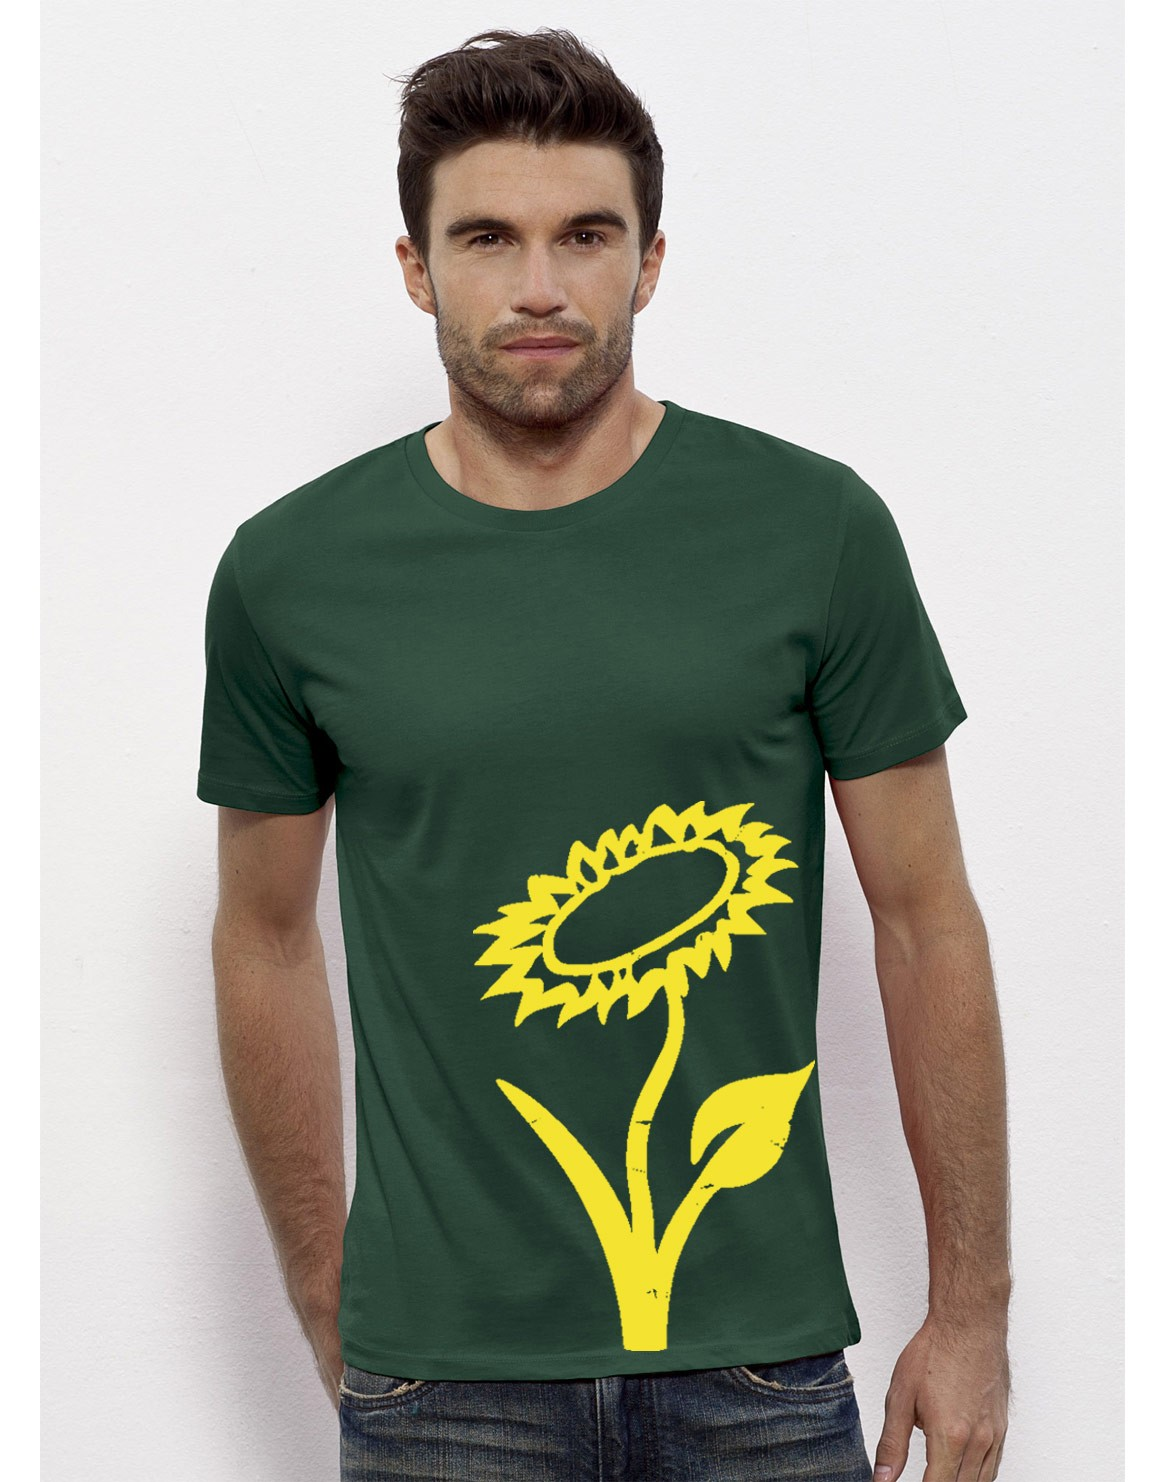 Vlower T-Shirt Grün-Gelb